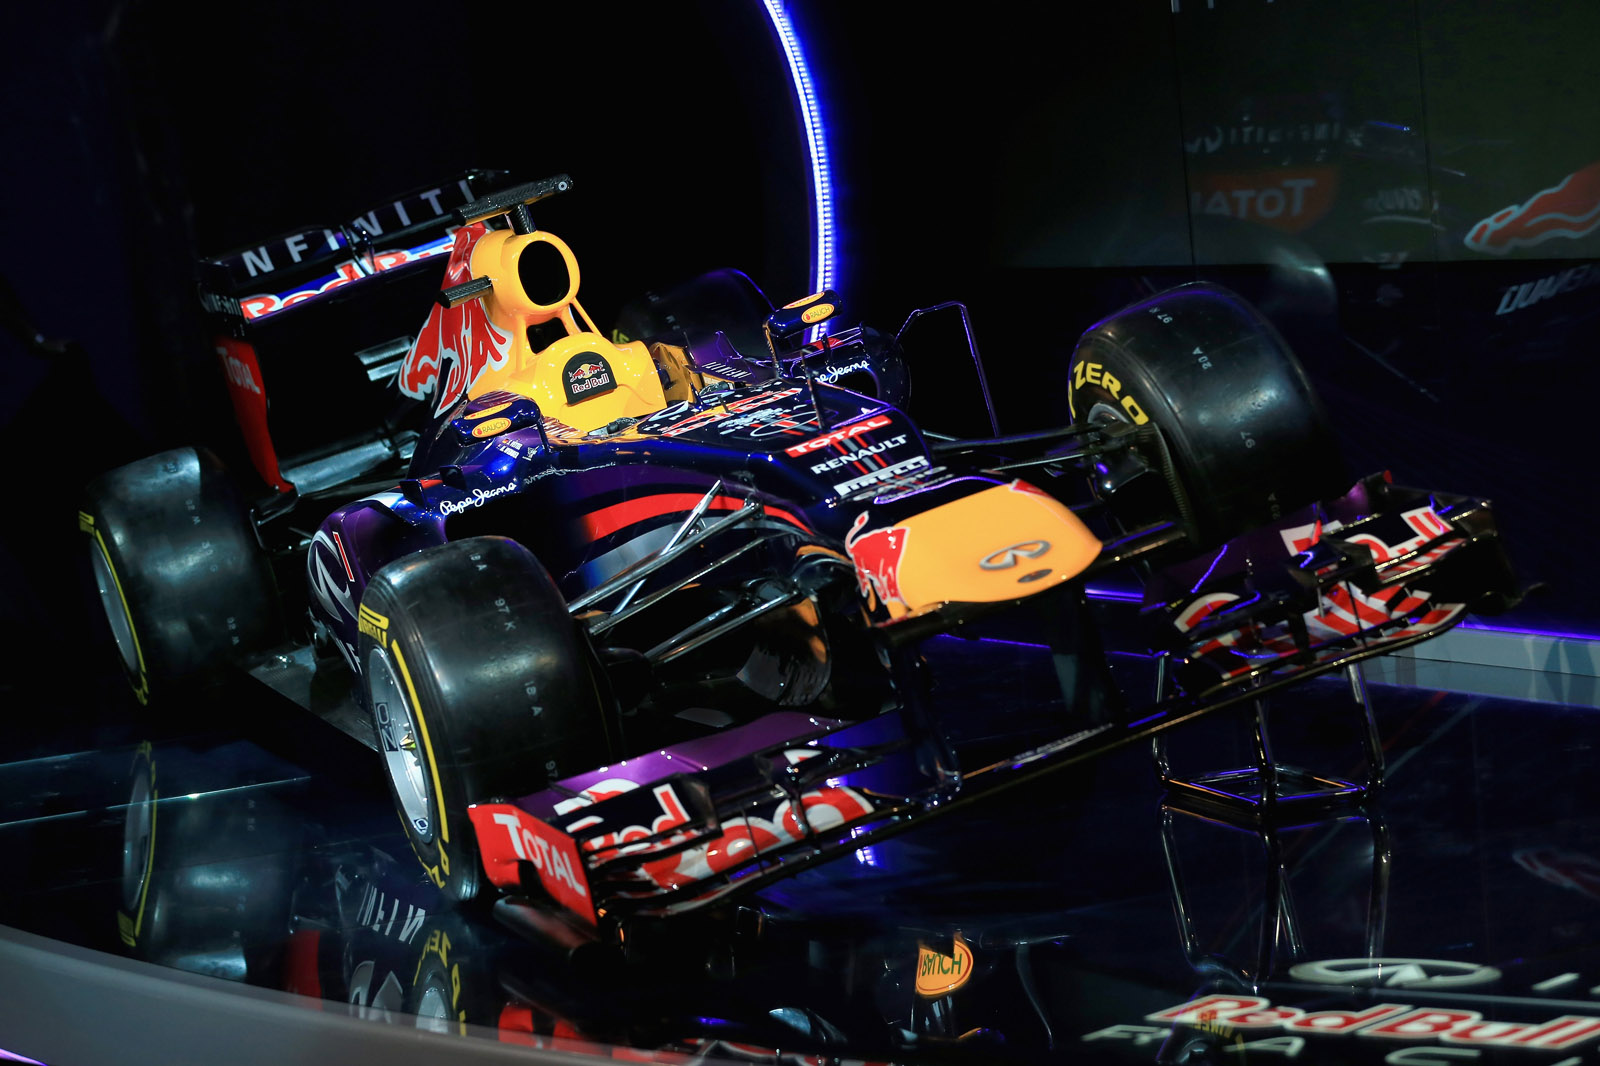 Free Download Red Bull Racing Wallpapers Red Bull Racing Hd